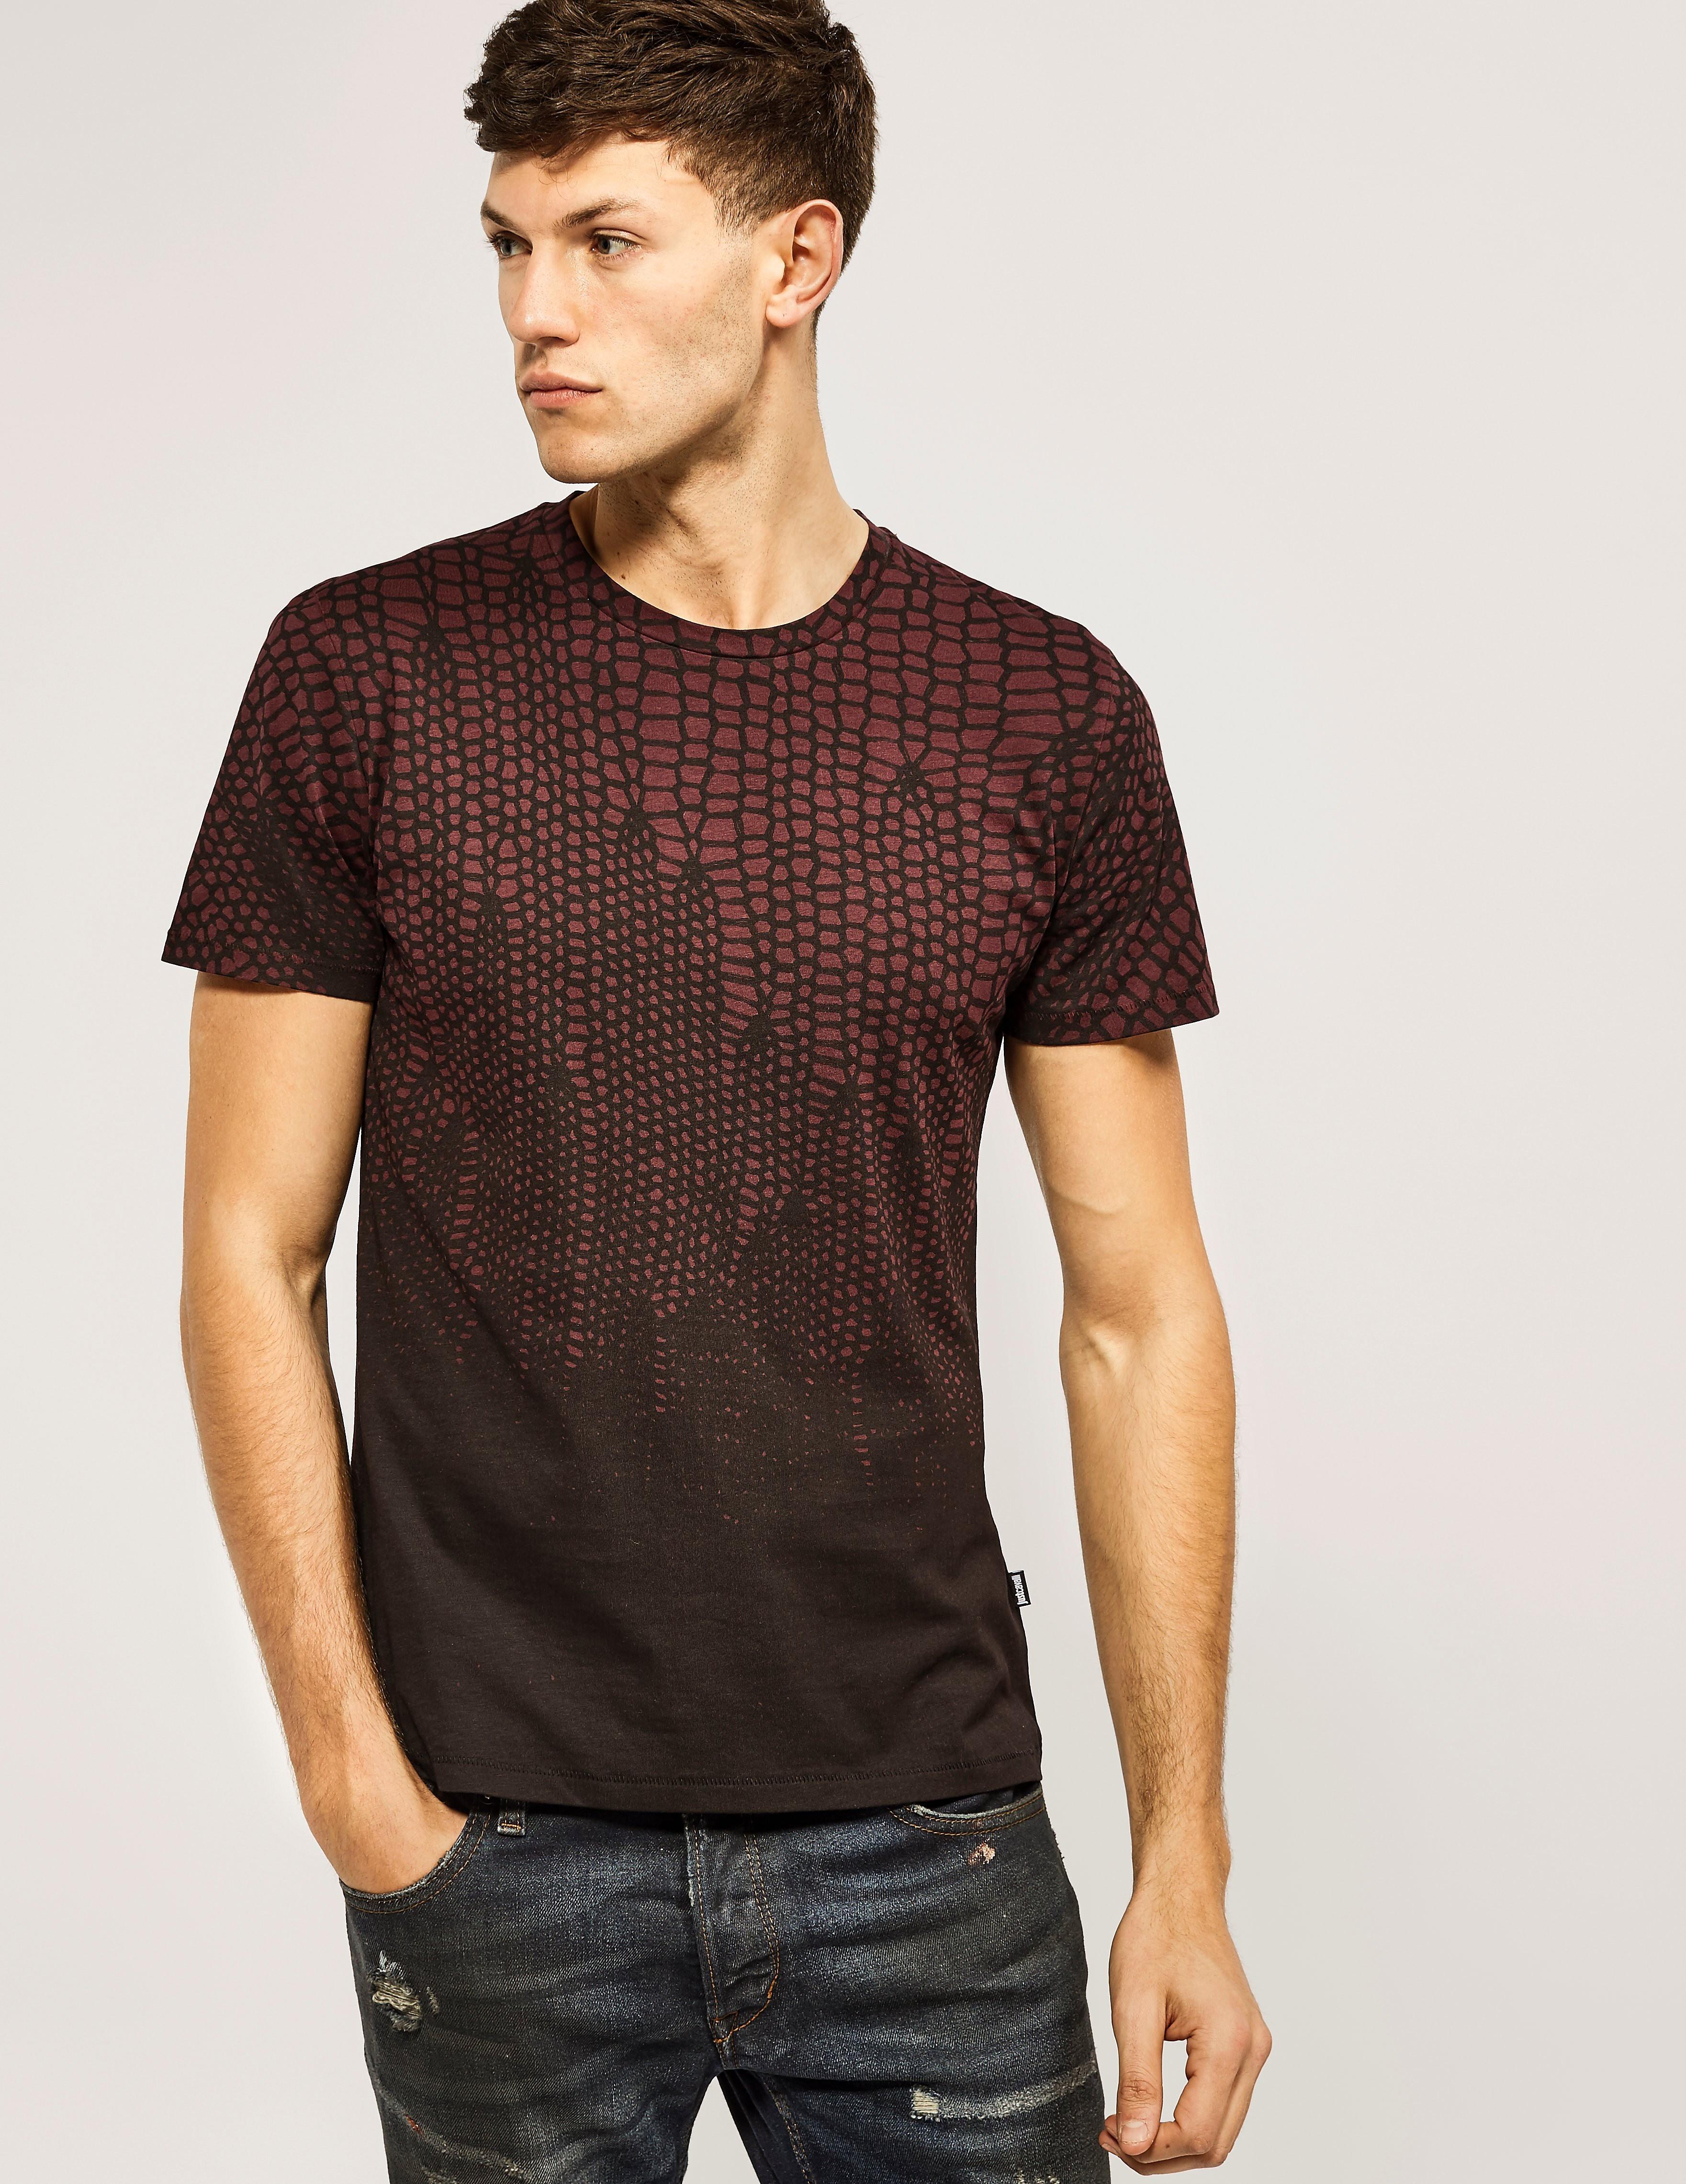 Just Cavalli Honeycomb T-Shirt